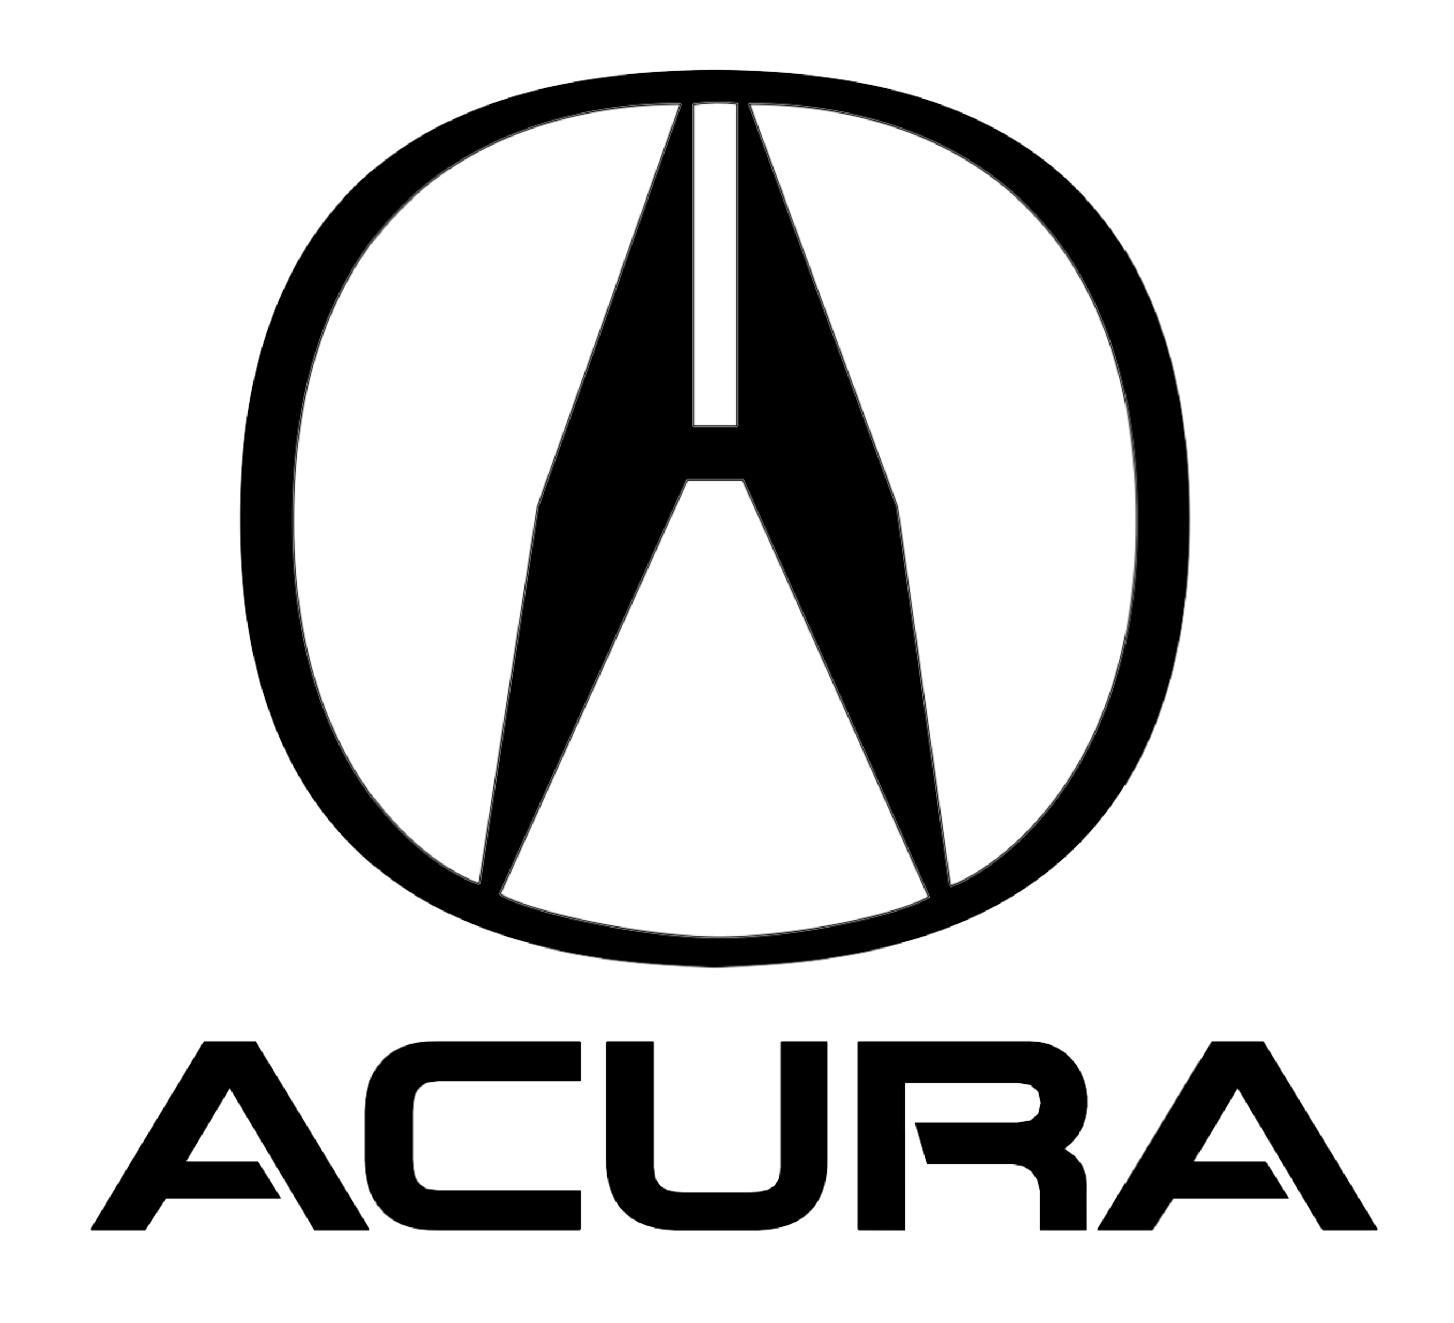 Acura logo Wallpaper 1454x1323